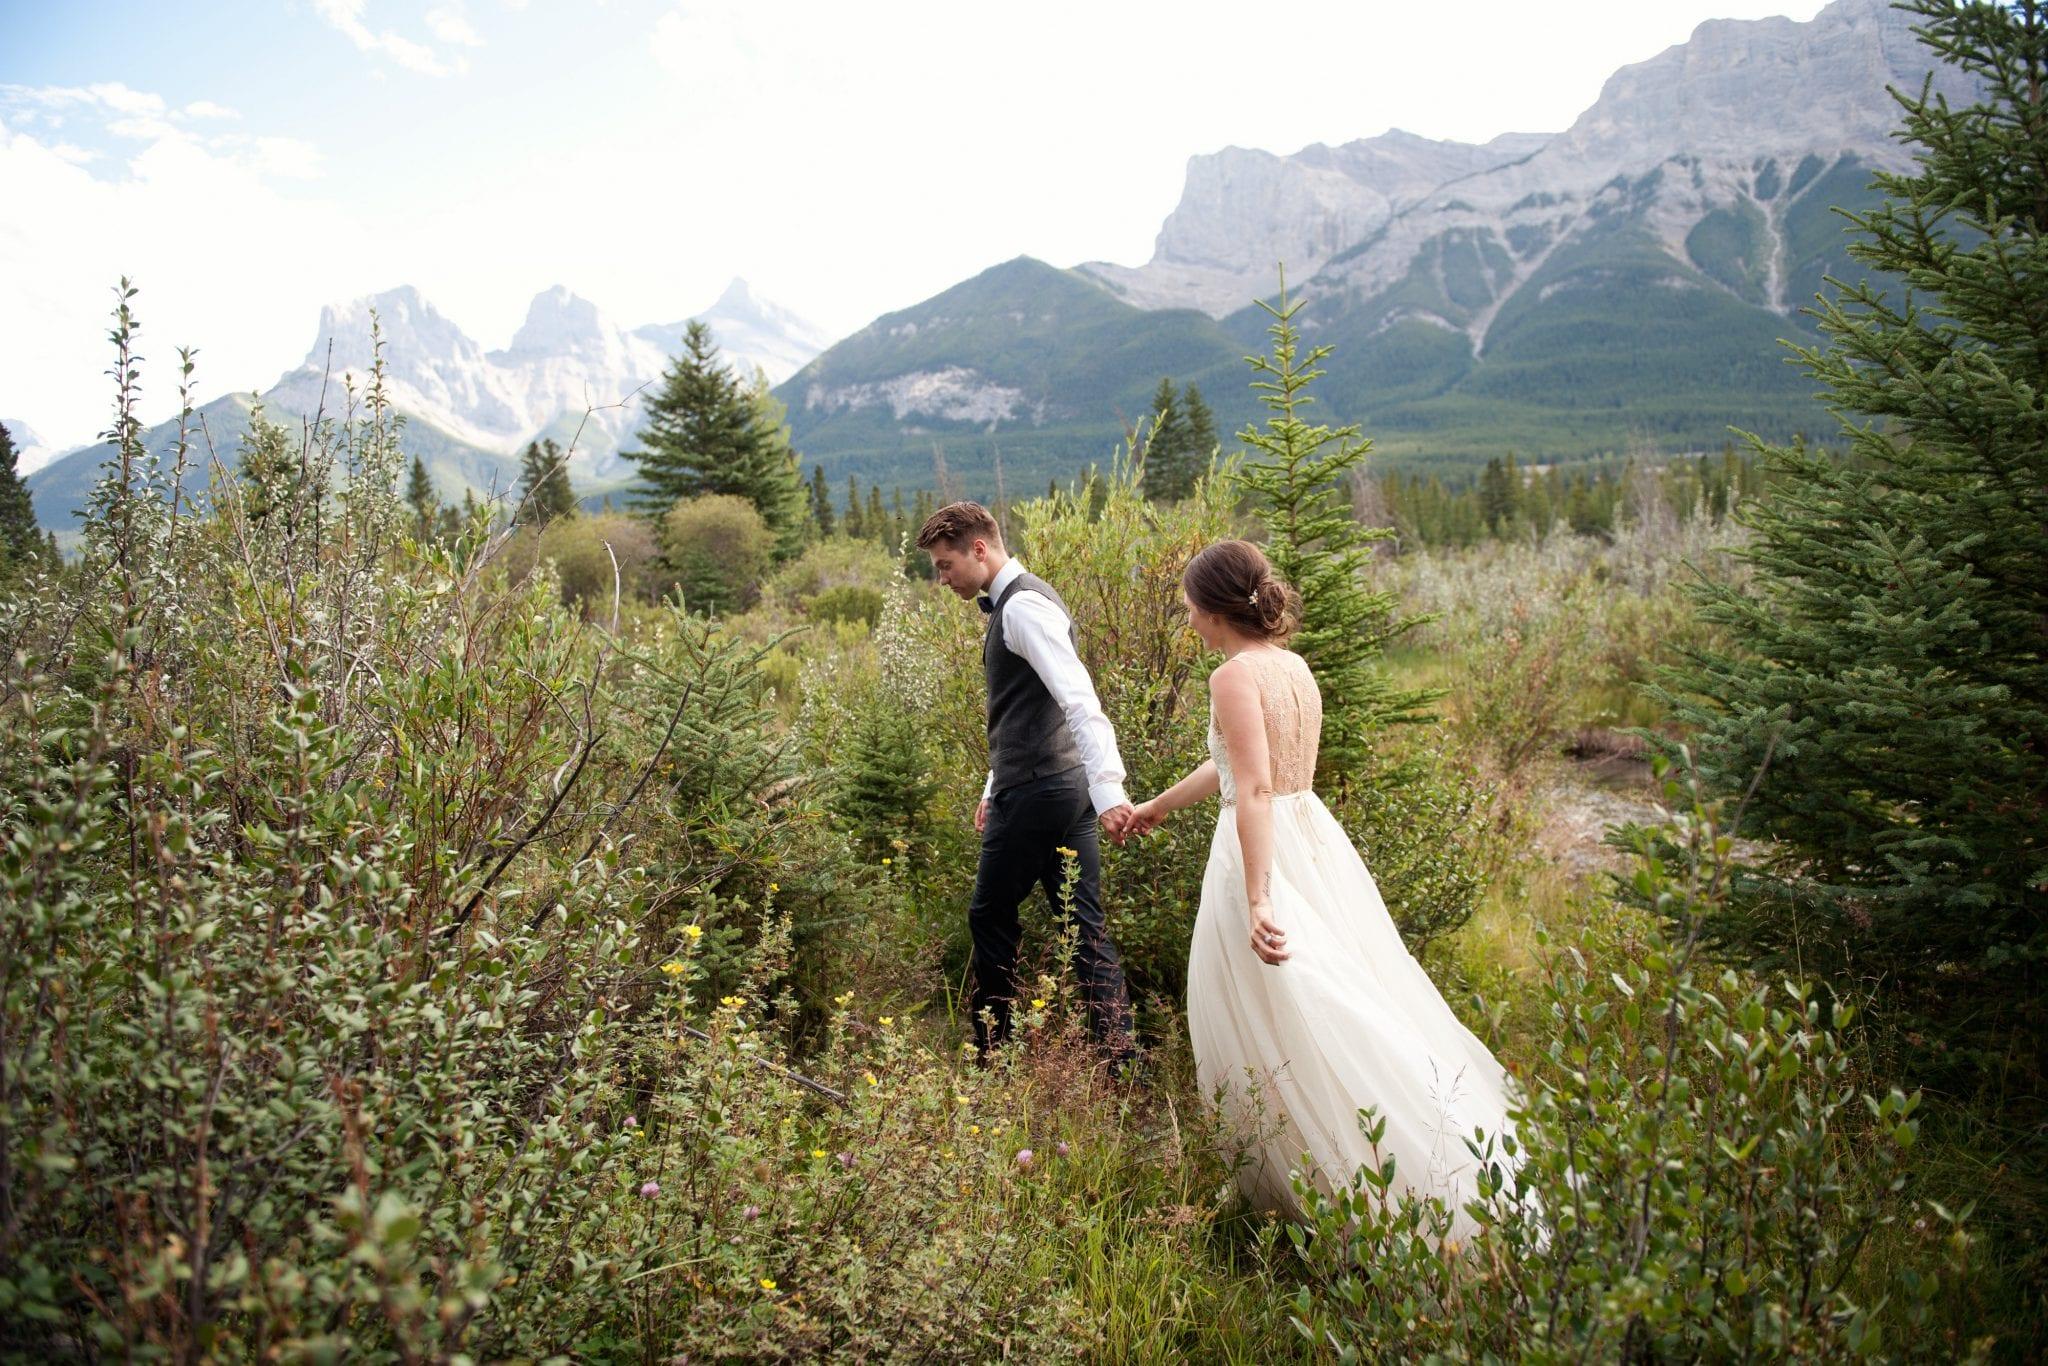 Walk in the mountains - Photo credit Tara Whittaker Photography